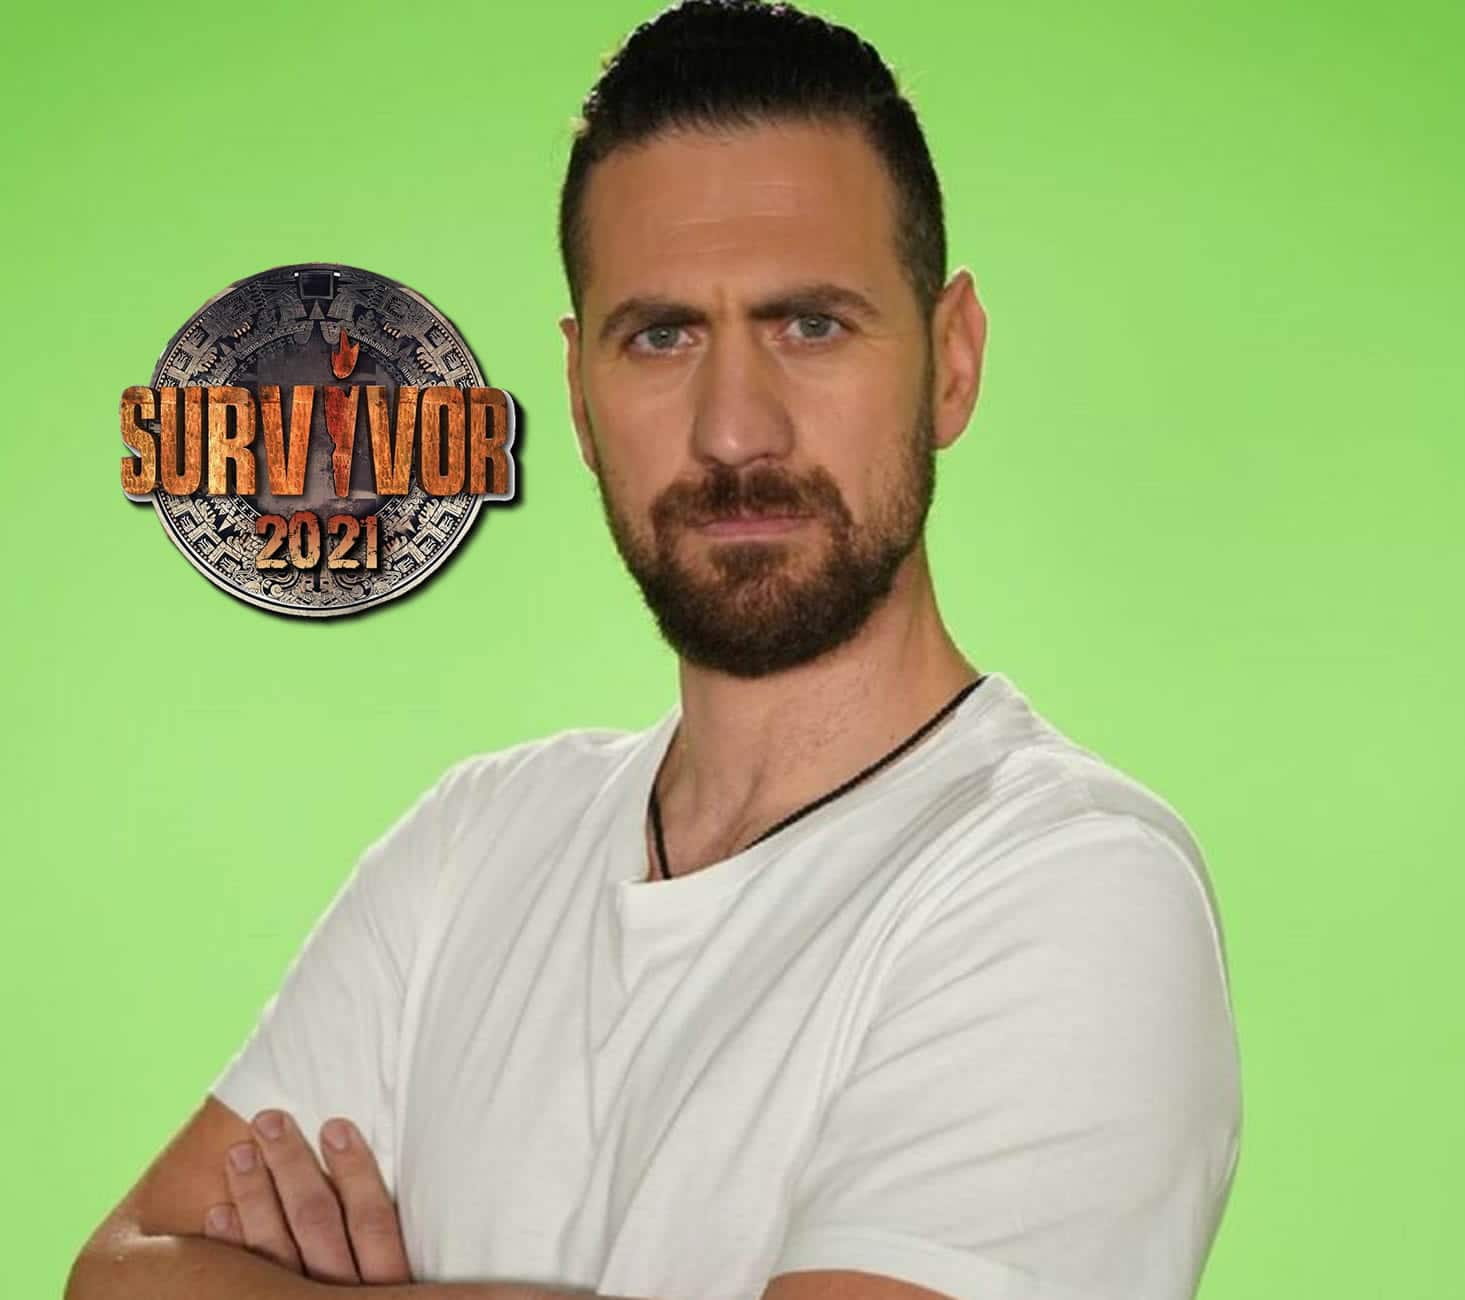 Survivor 2021, Κώστας Παπαδόπουλο